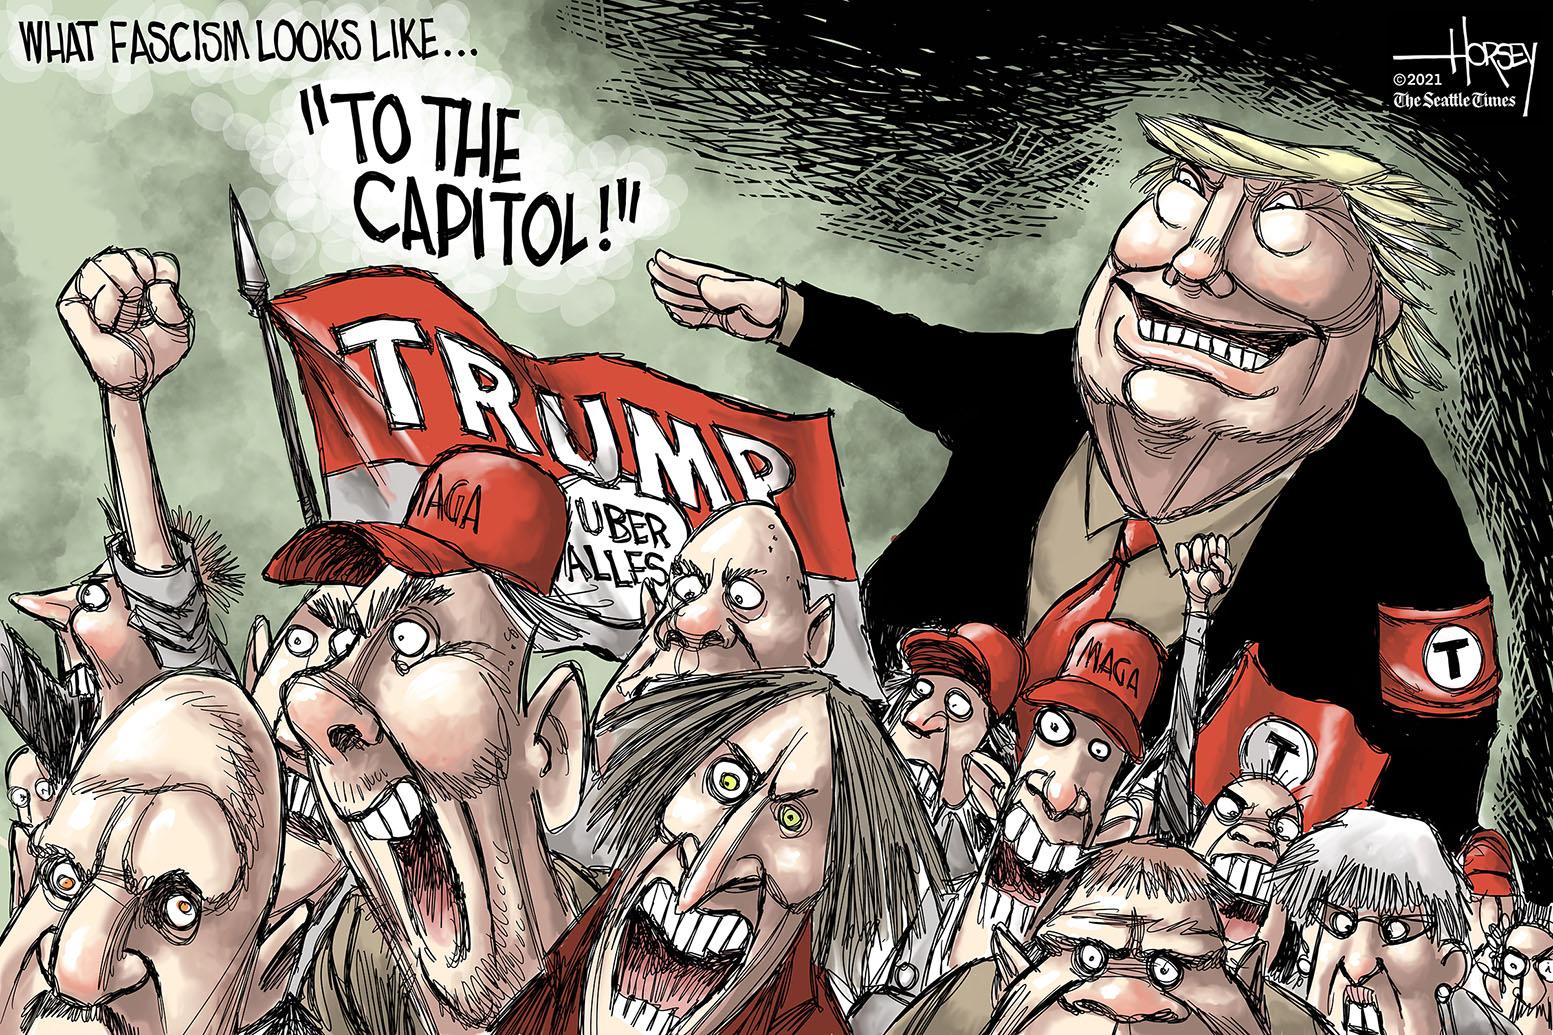 Jan. 9: Trump Fascism